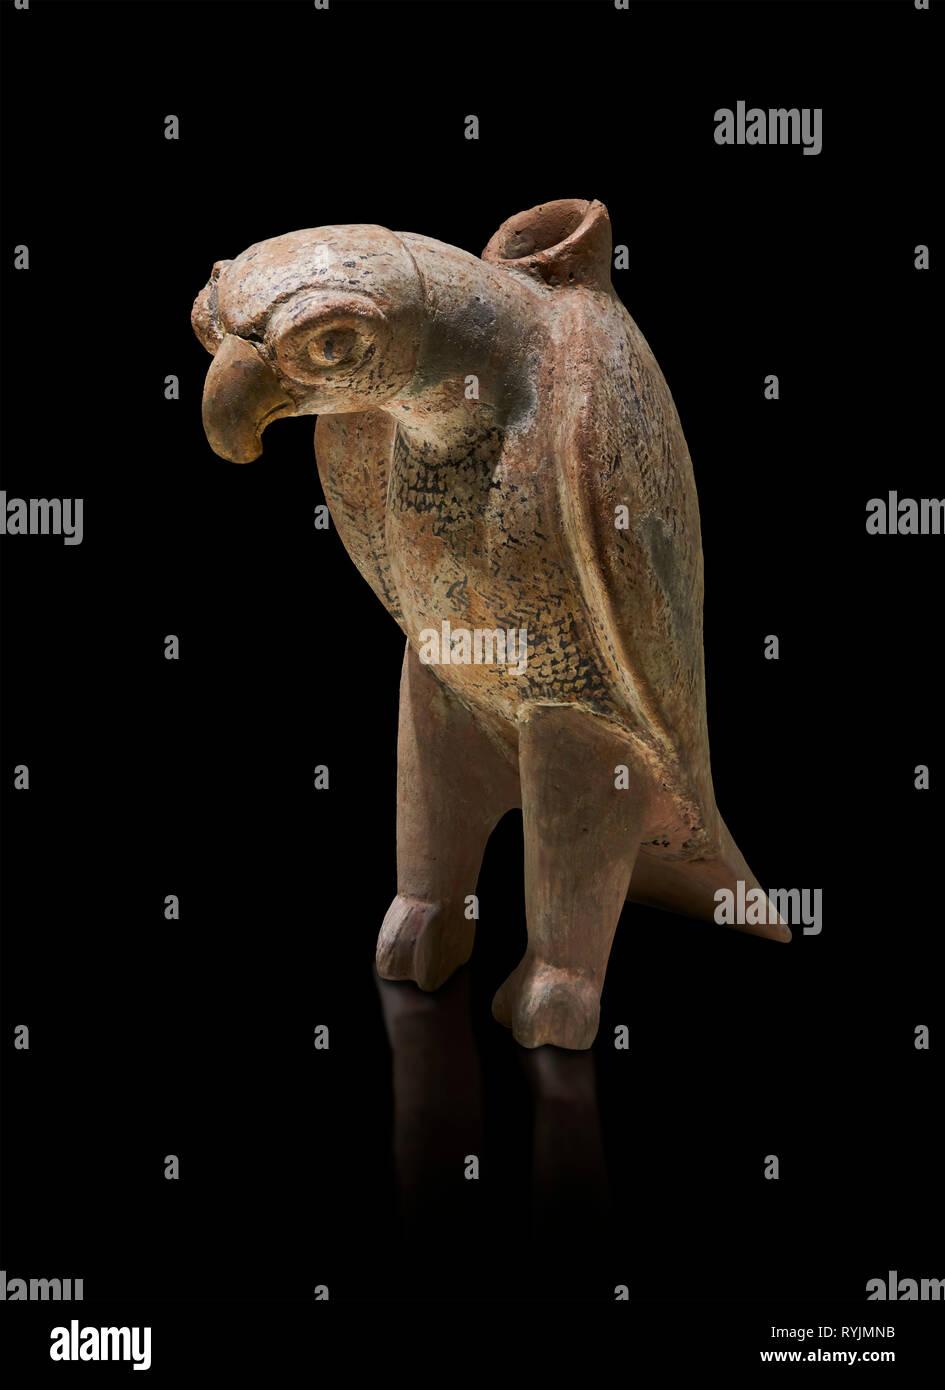 Bronze Age Anatolian terra Cotta eagle shaped ritual vessel - 19th to 17th century BC - Kültepe Kanesh - Museum of Anatolian Civilisations, Ankara, Tu - Stock Image